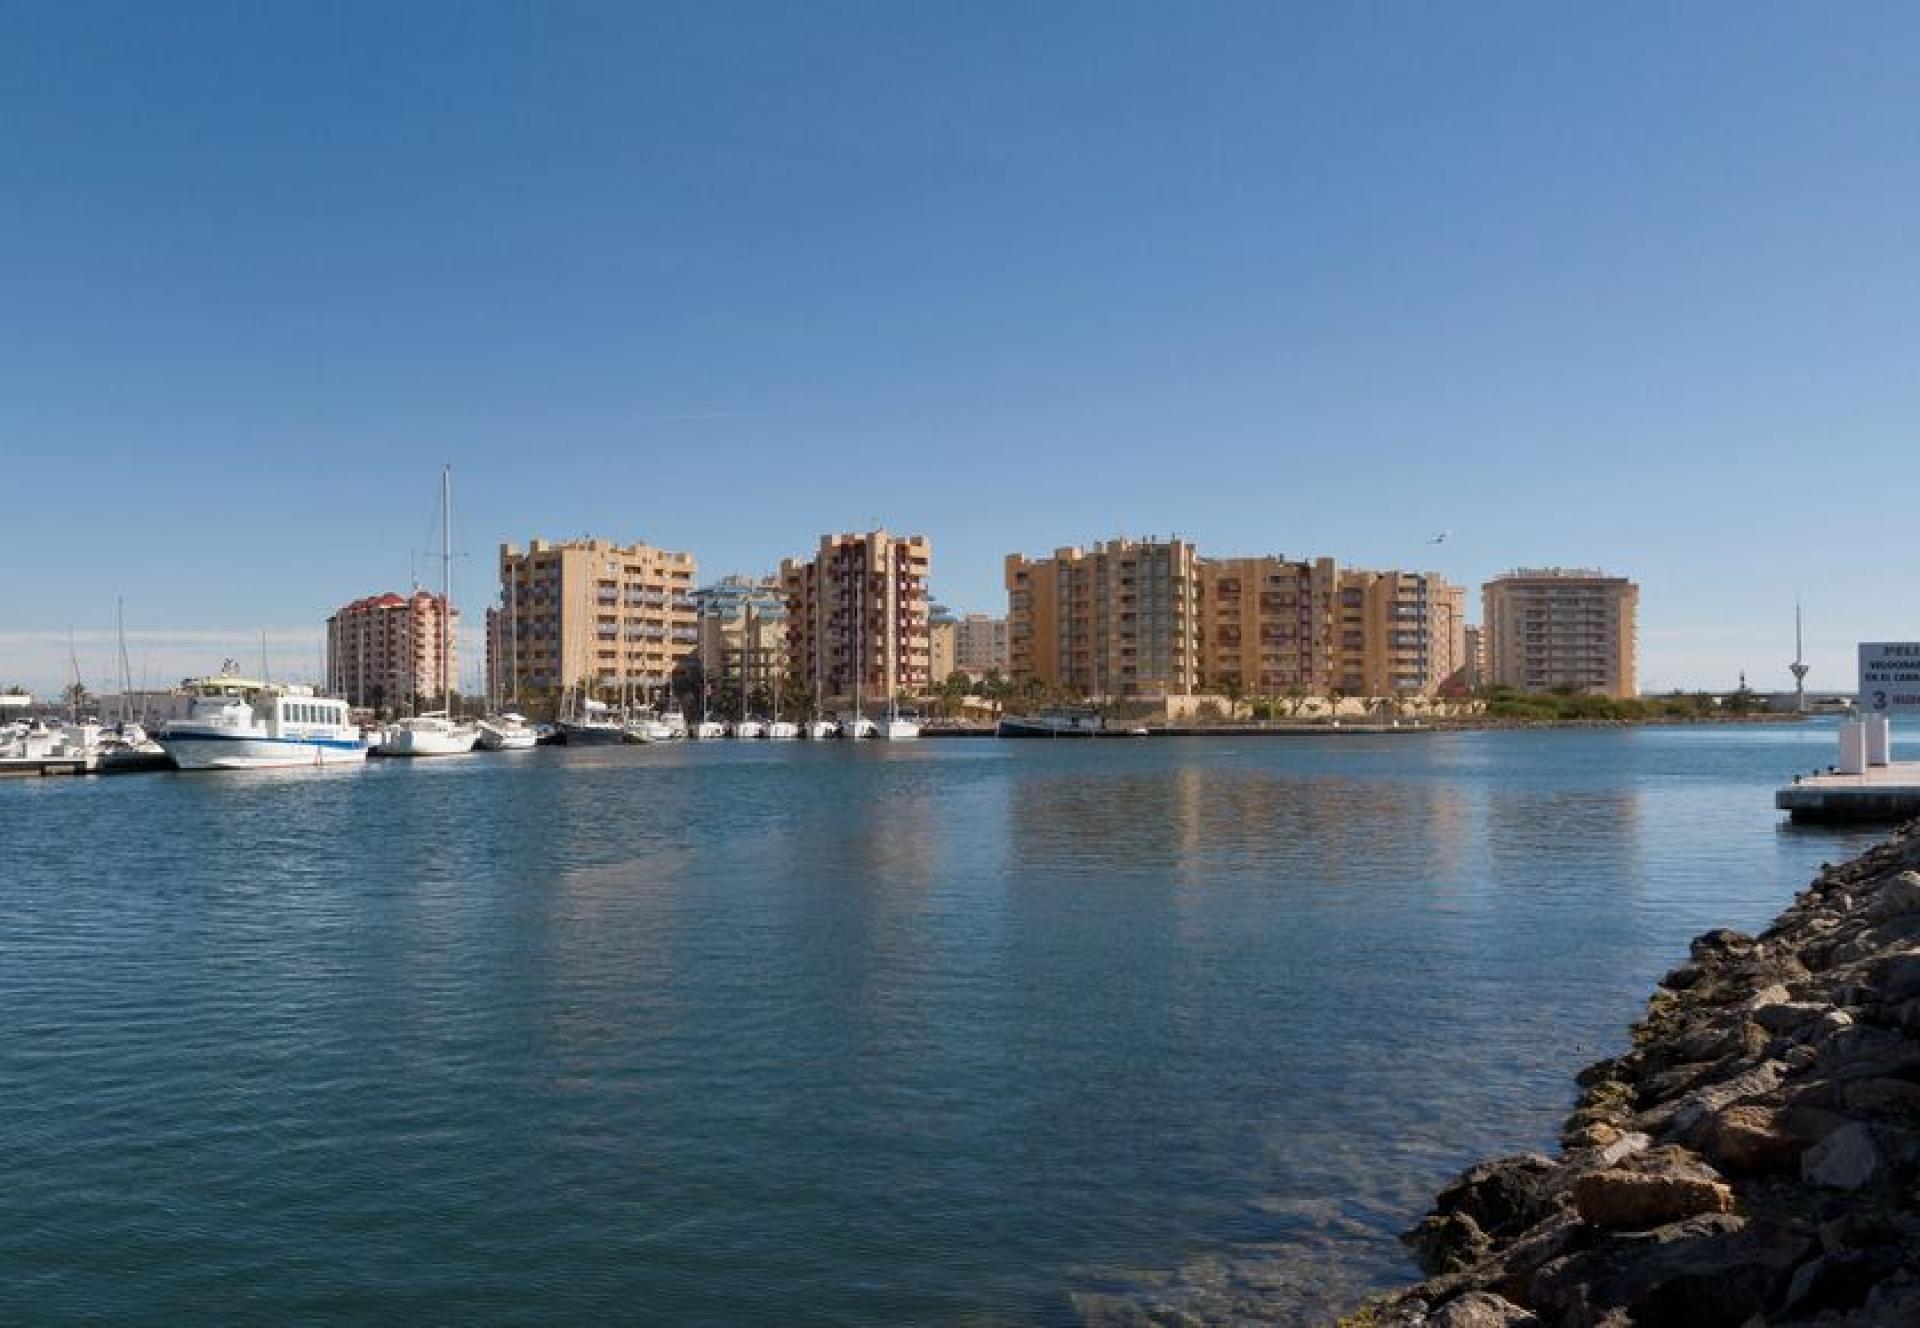 Appartements avec vue sur la mer, La Manga del Mar Menor in Medvilla Spanje